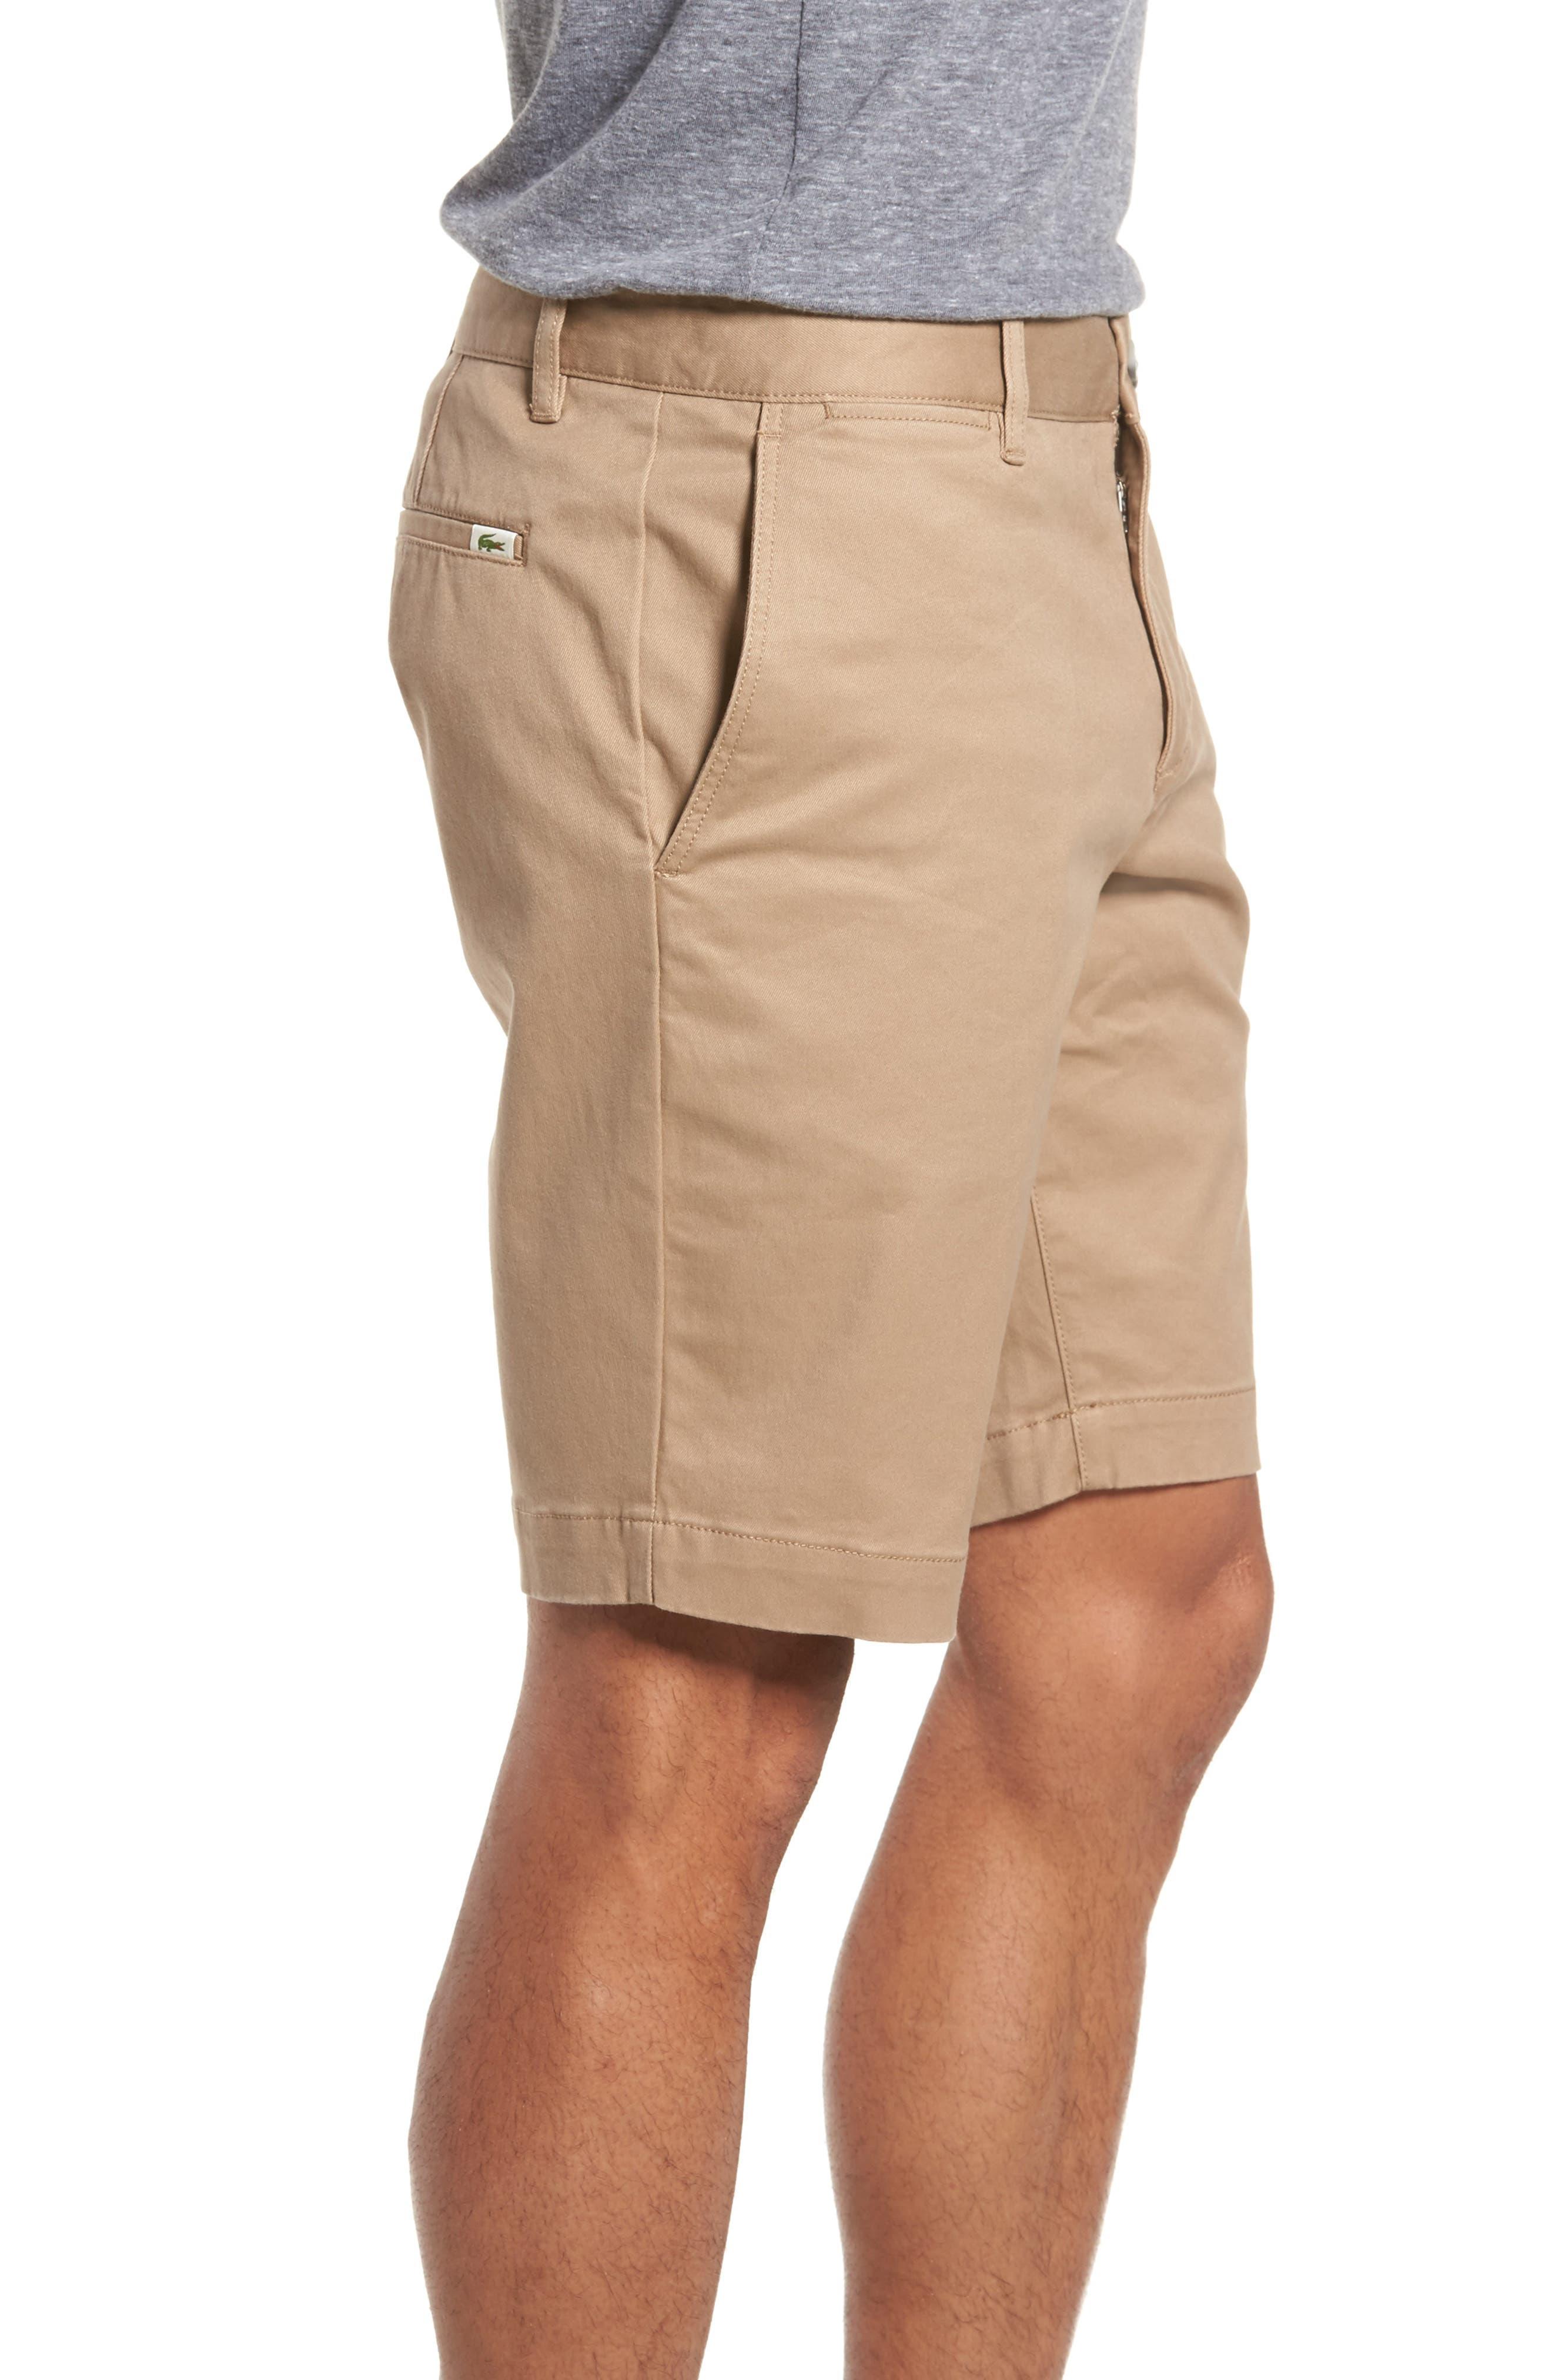 Slim Fit Chino Shorts,                             Alternate thumbnail 3, color,                             Kraft Beige